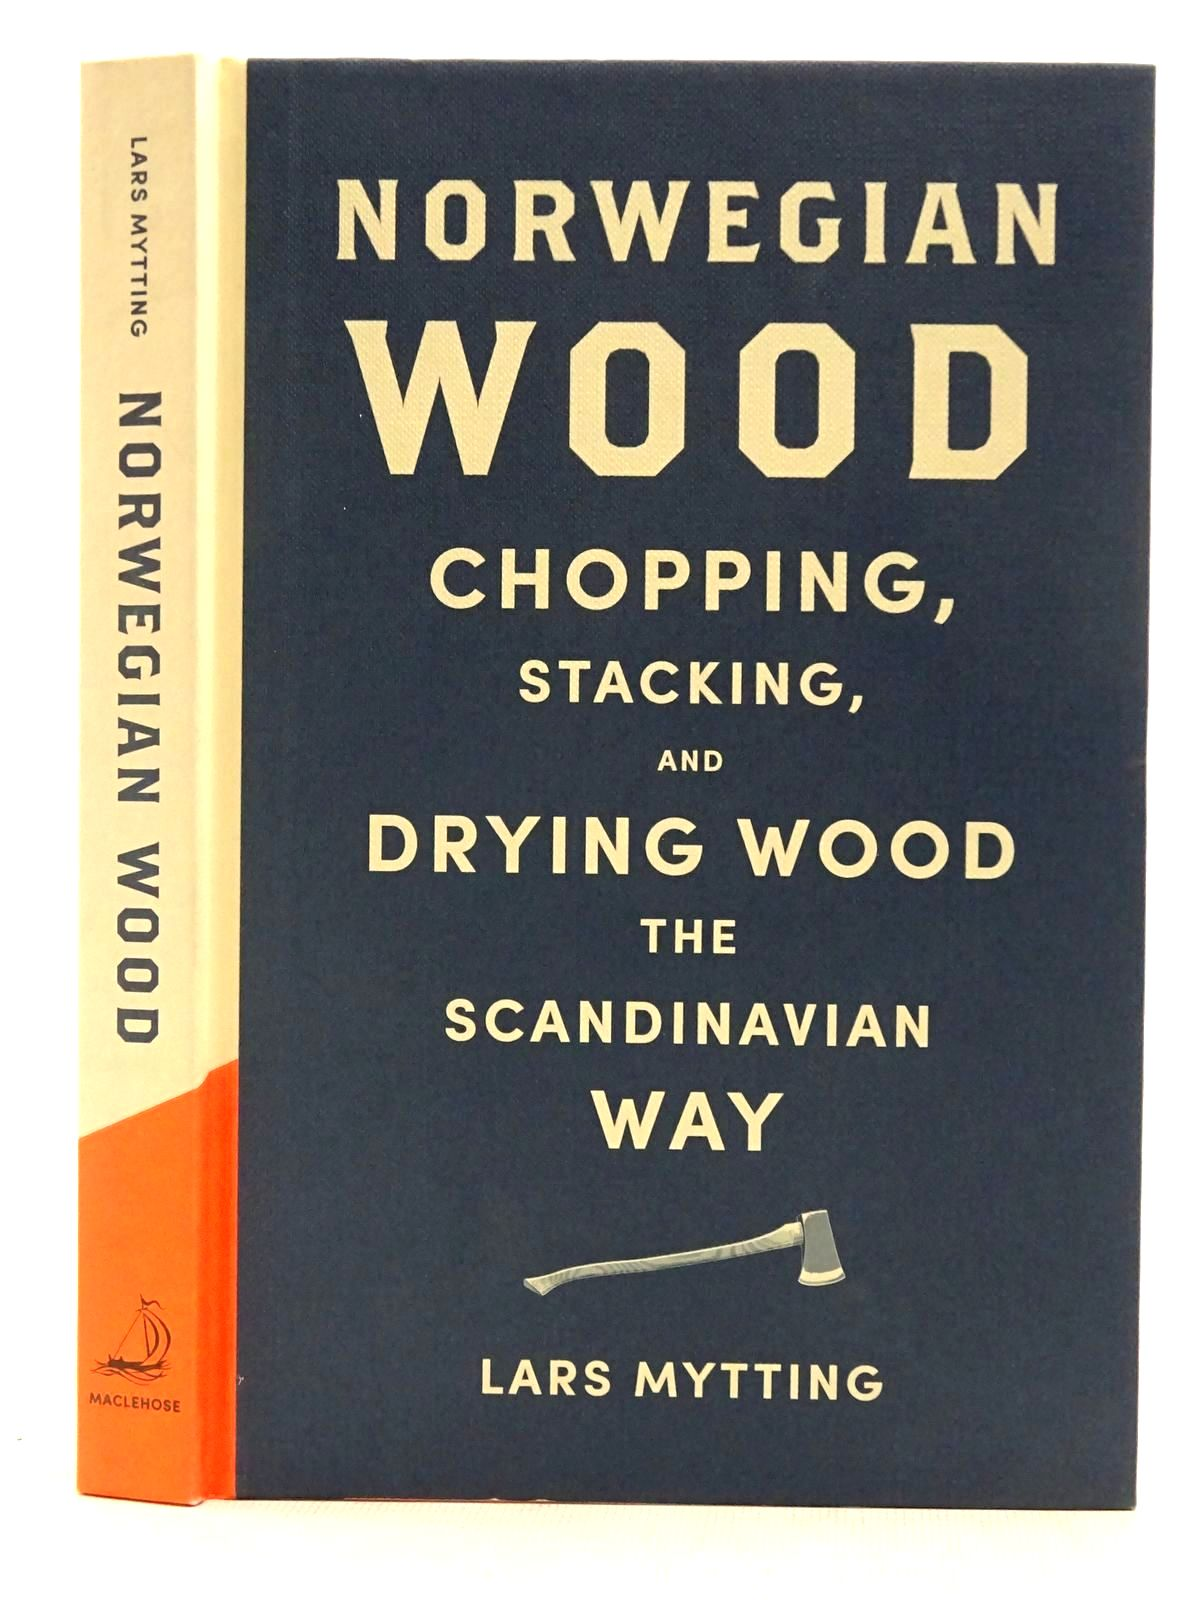 Photo of NORWEGIAN WOOD CHOPPING, STACKING, AND DRYING WOOD THE SCANDINAVIAN WAY